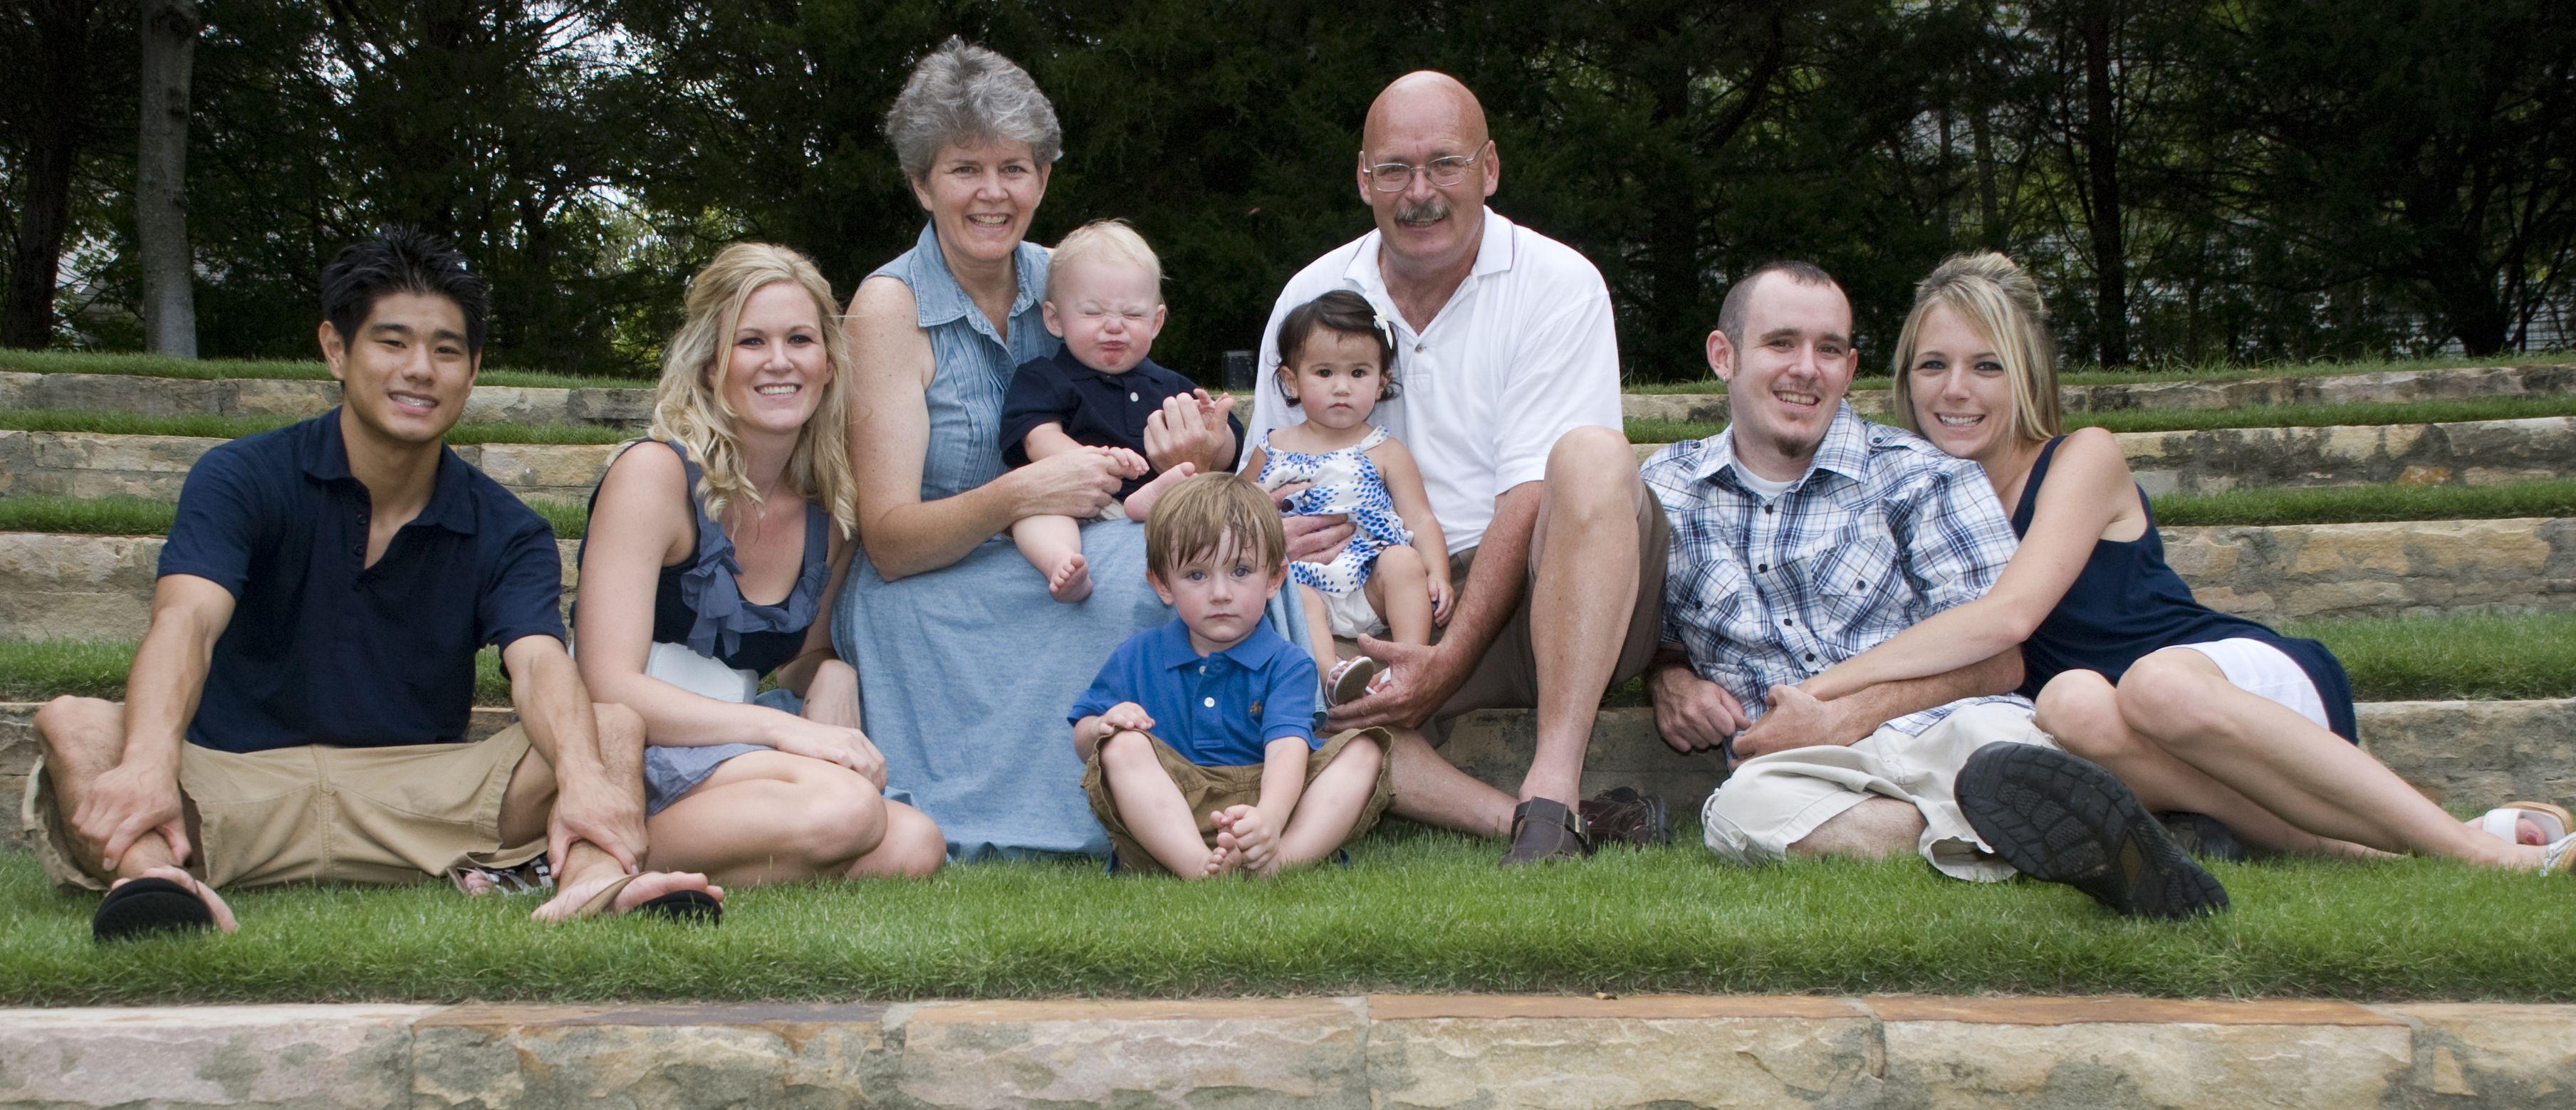 Family Photo Shoot Large Family Poses Large Family Photo Shoot Tips Ideas The